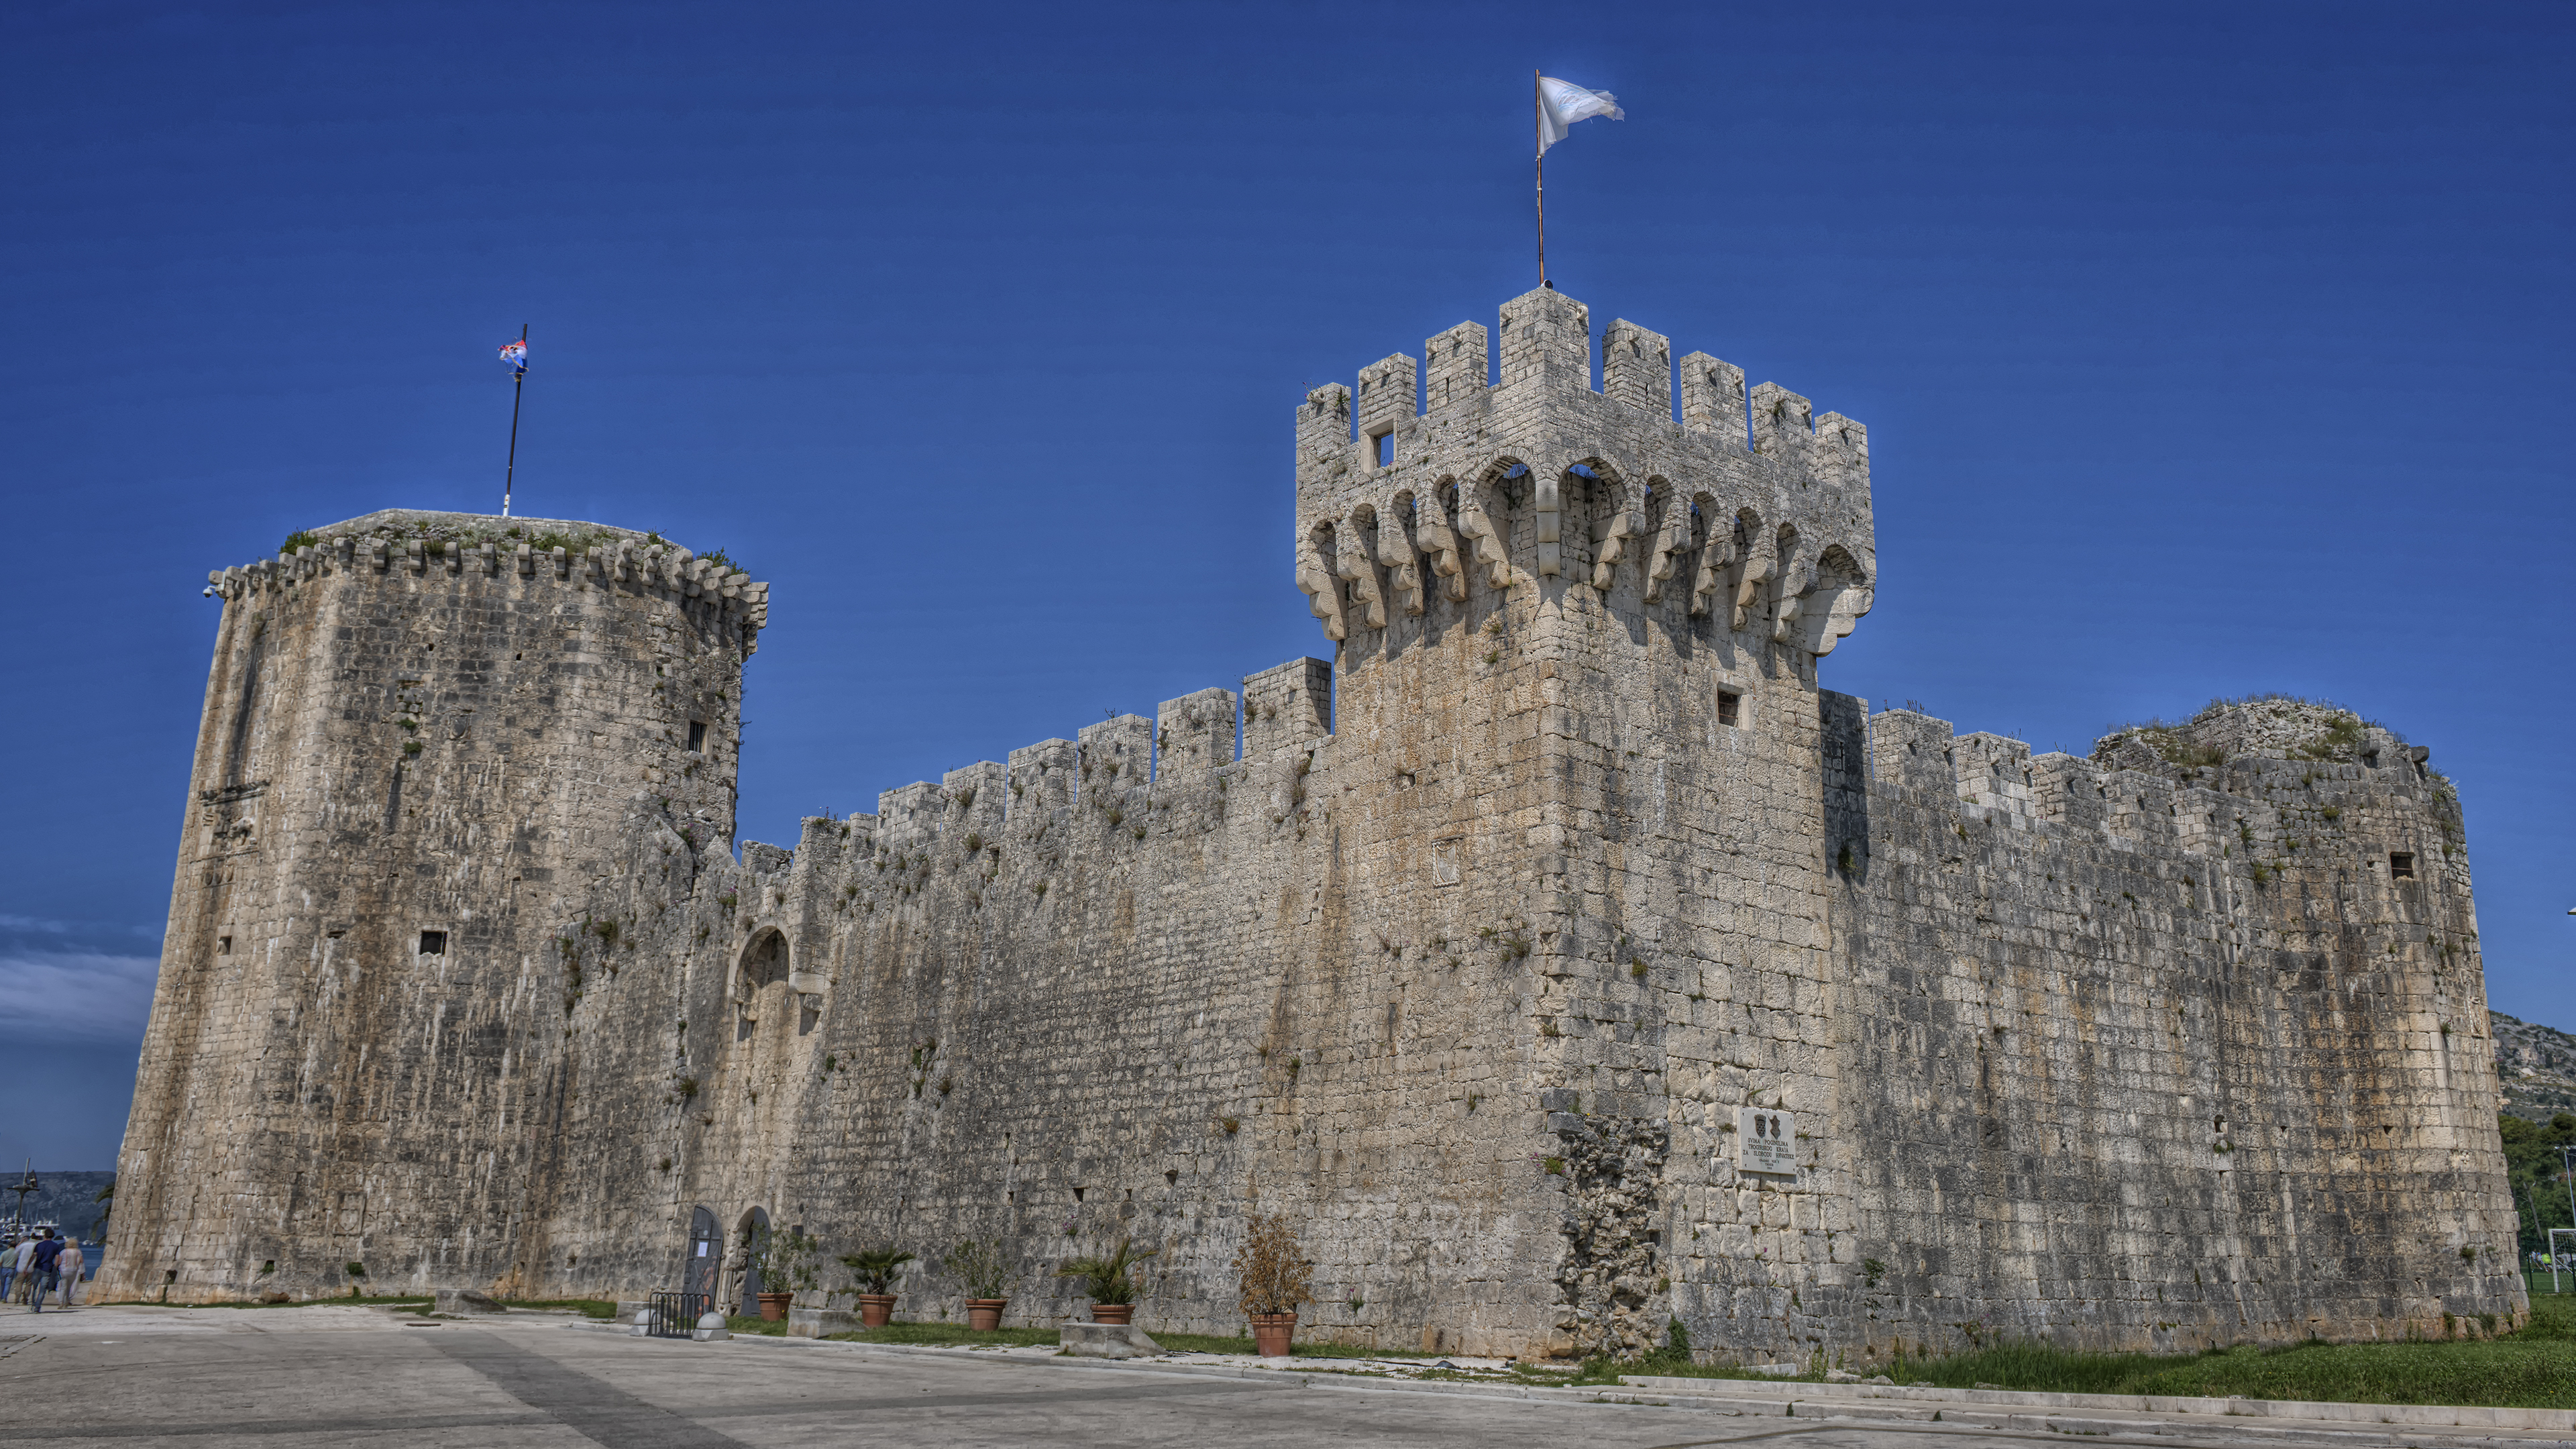 Kamerlengo castle, Trogir